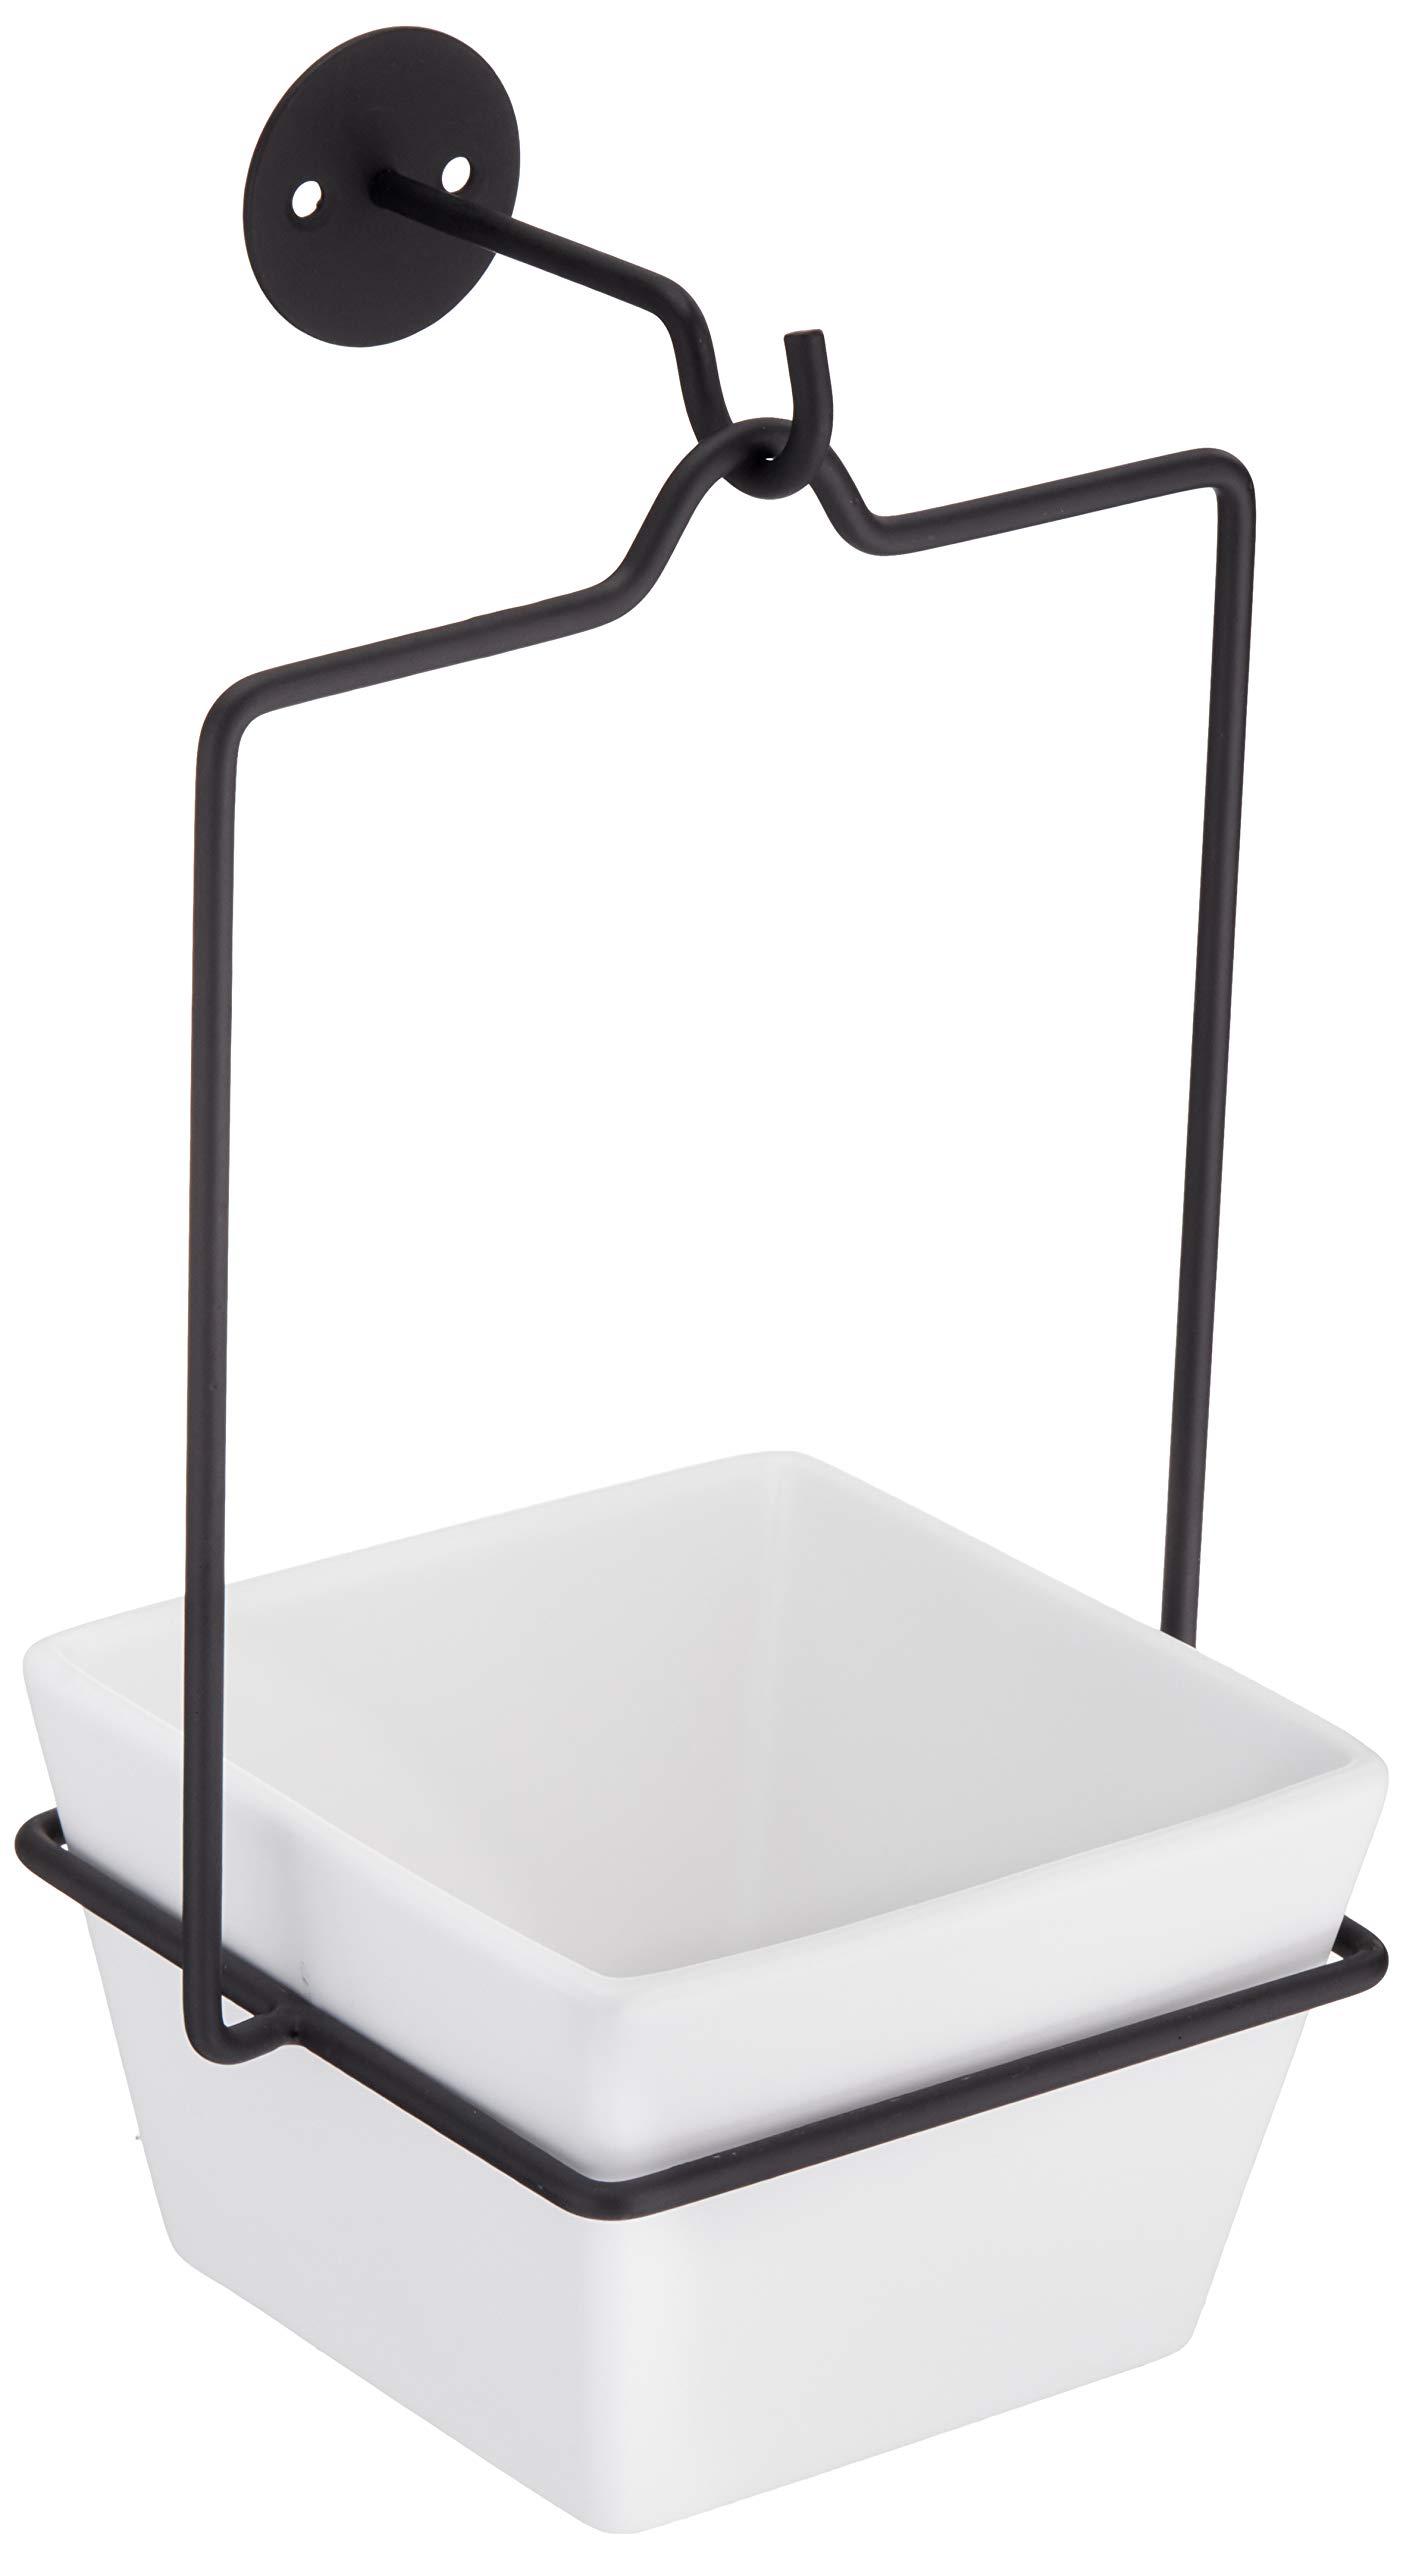 AmazonBasics Hanging Planter, Square - White/Black